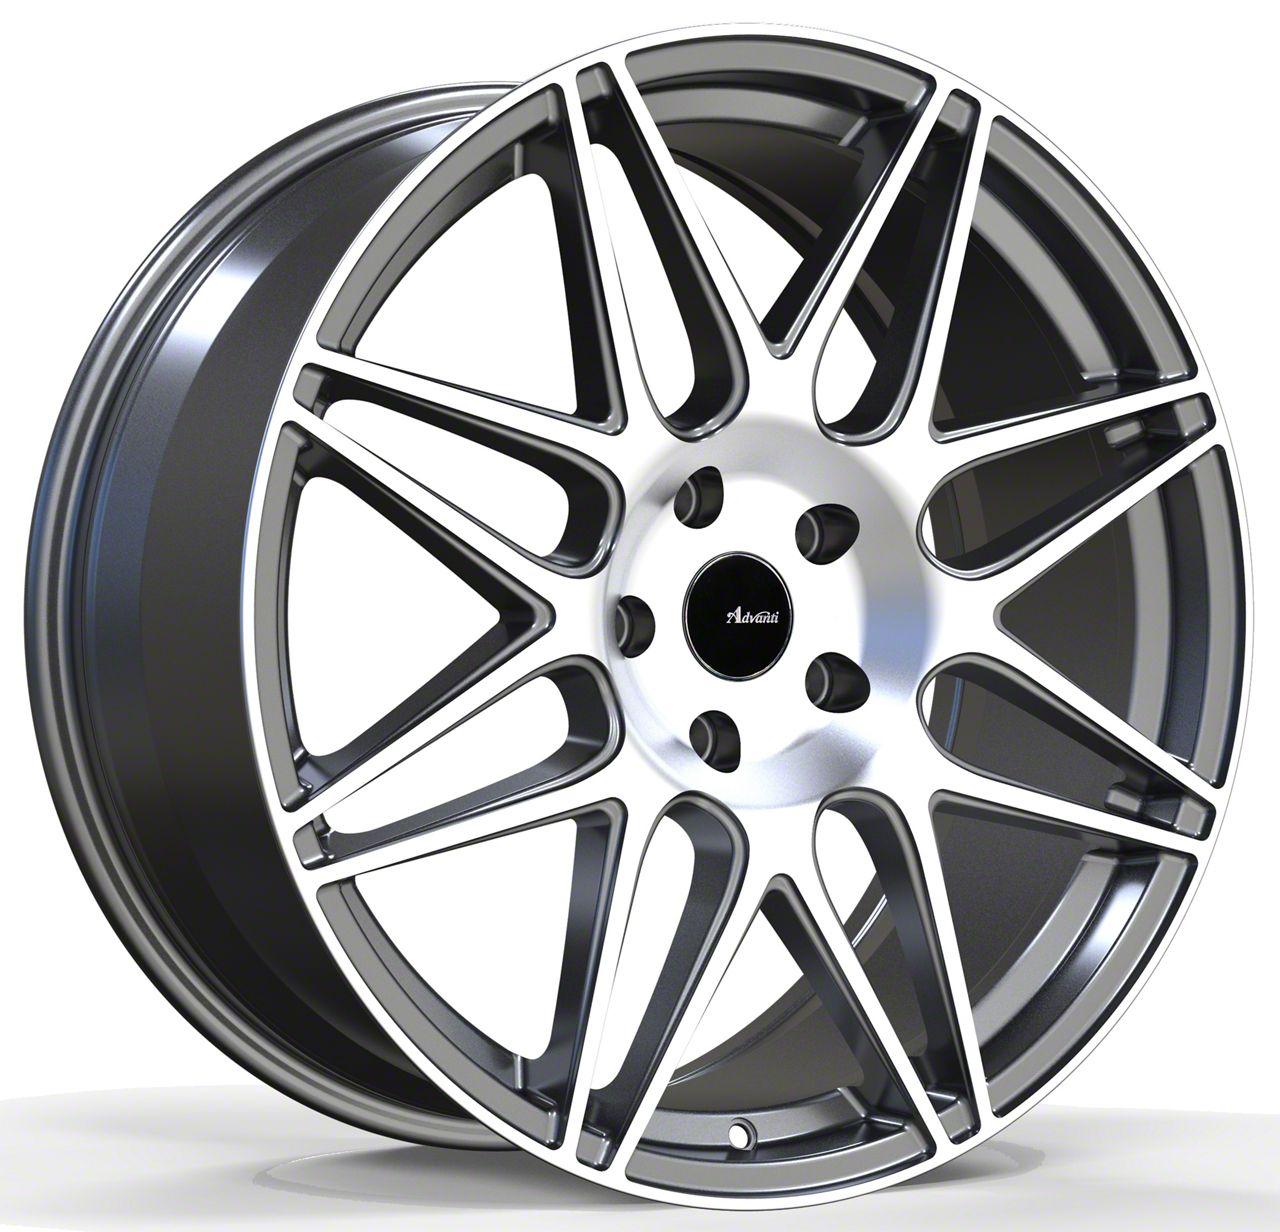 Advanti Classe Matte Gunmetal w/ Machined Face Wheel - 18x9 (05-14 Standard GT, V6)